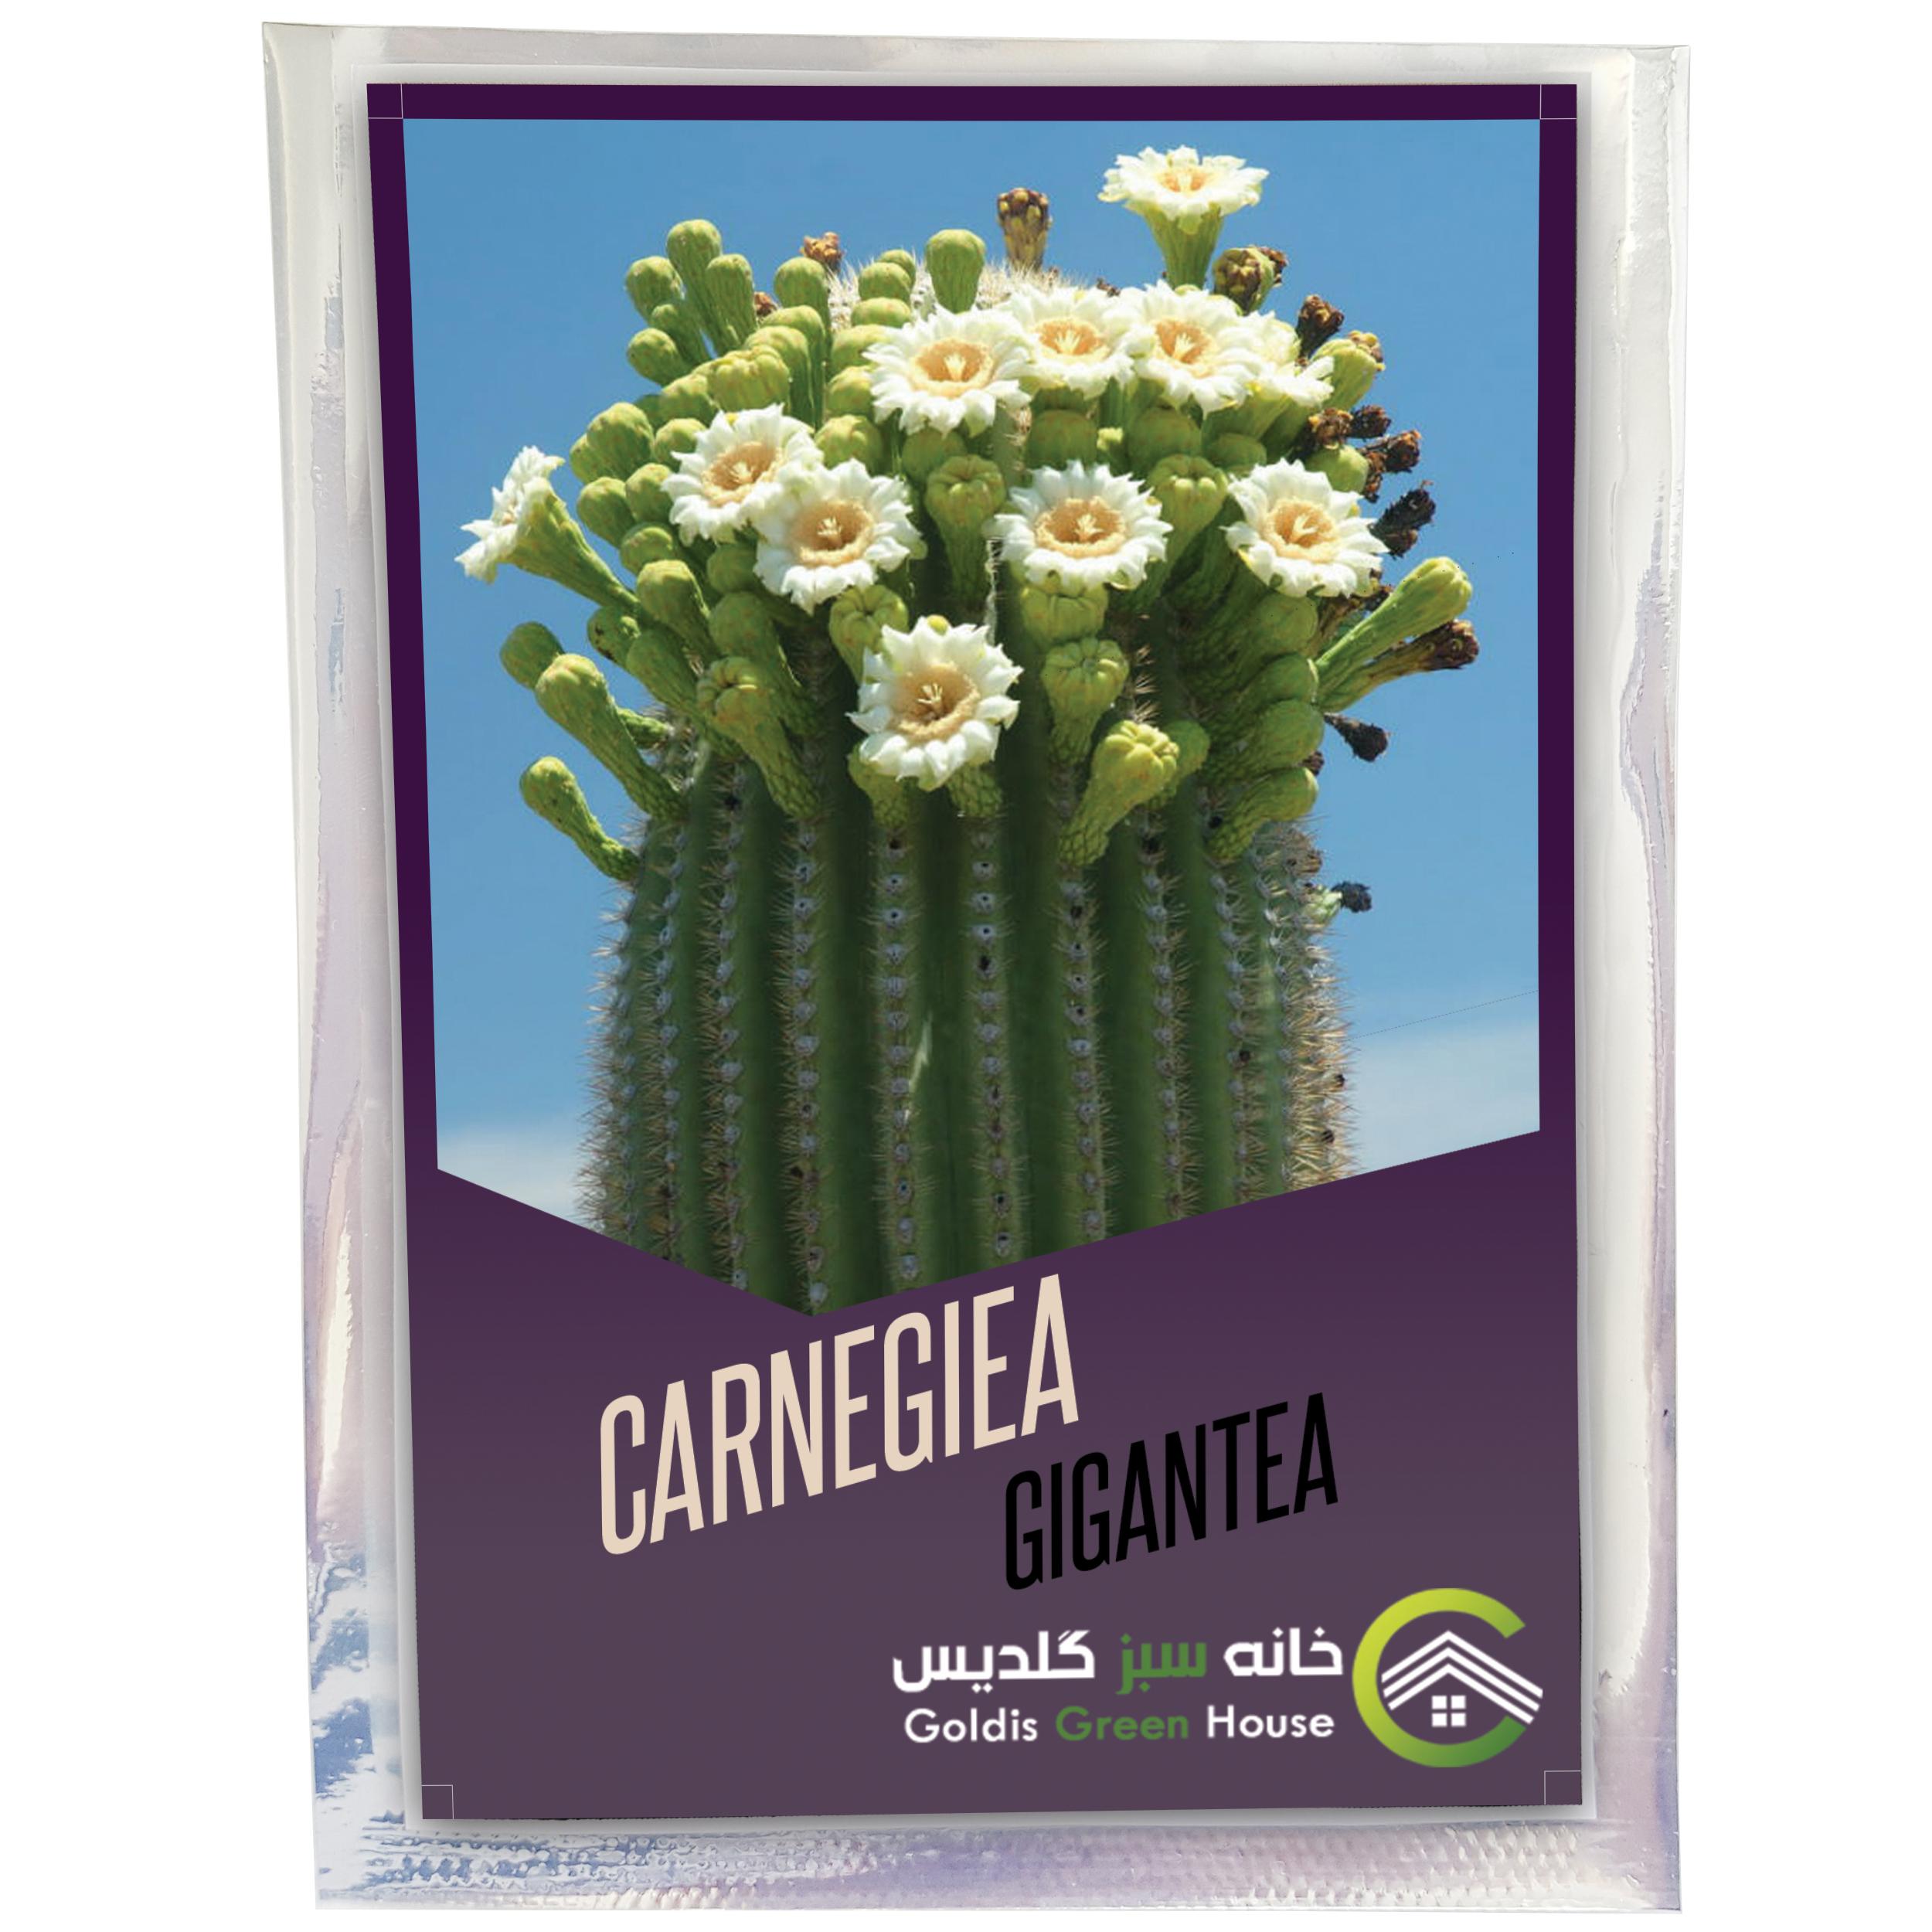 بذر کارنژیا جیگانتا خانه سبز گلدیس کد 1862 بسته 10 عددی